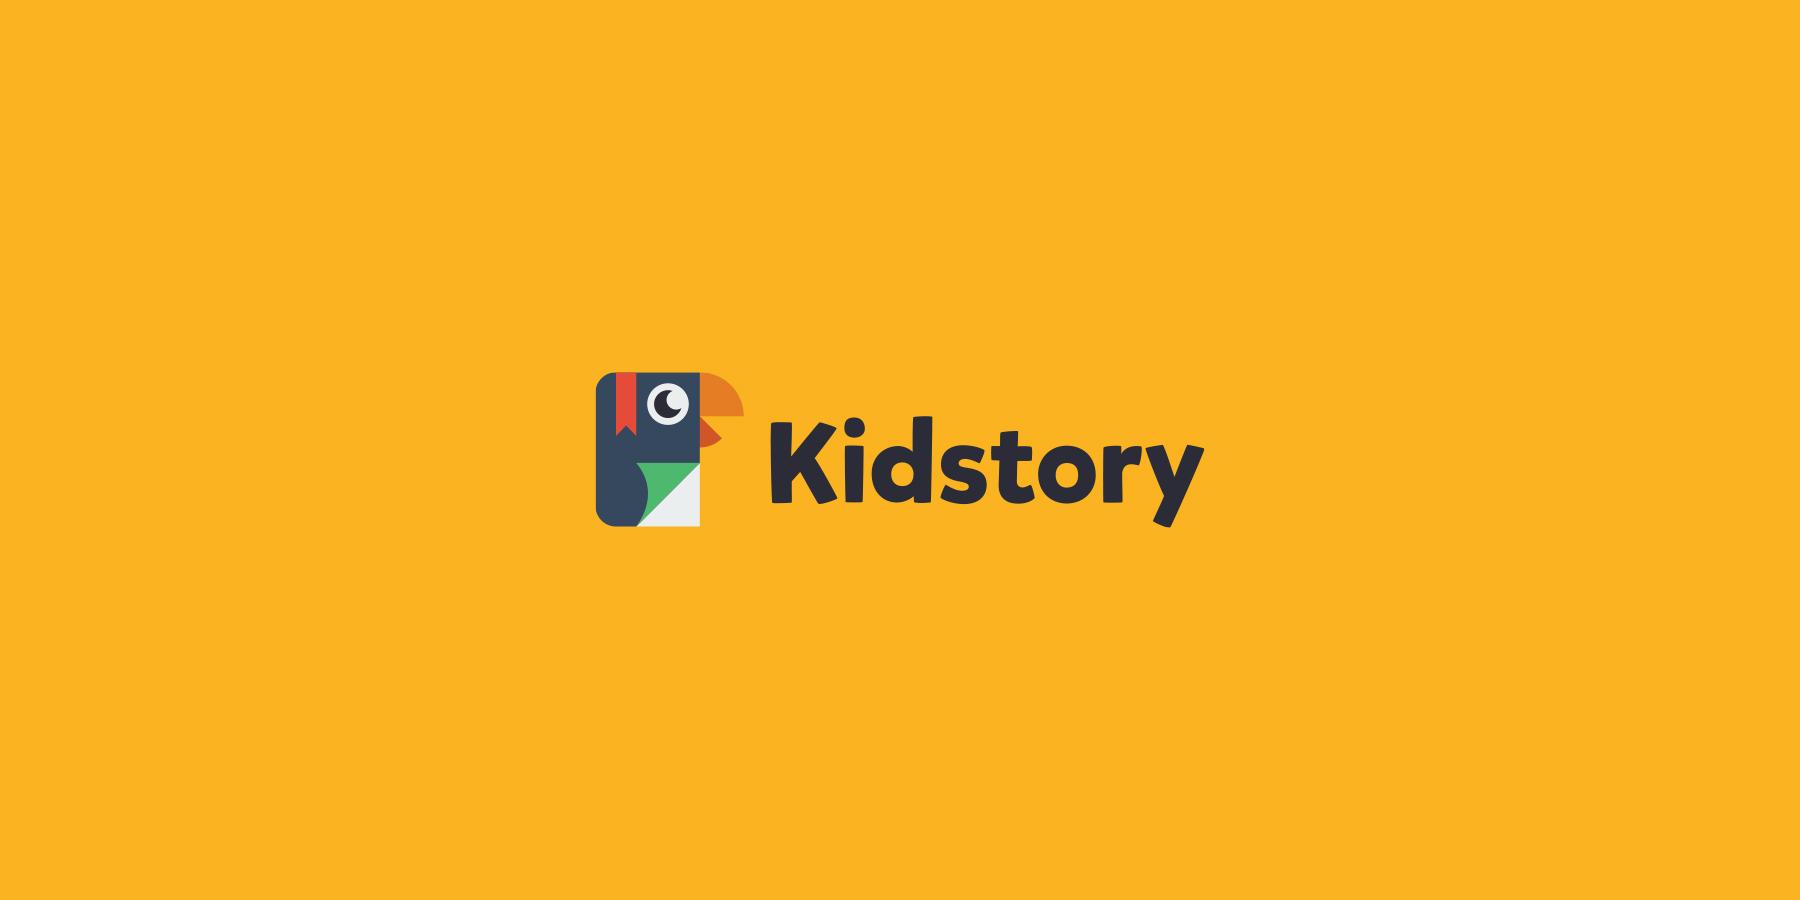 kid-story-logo-design-01